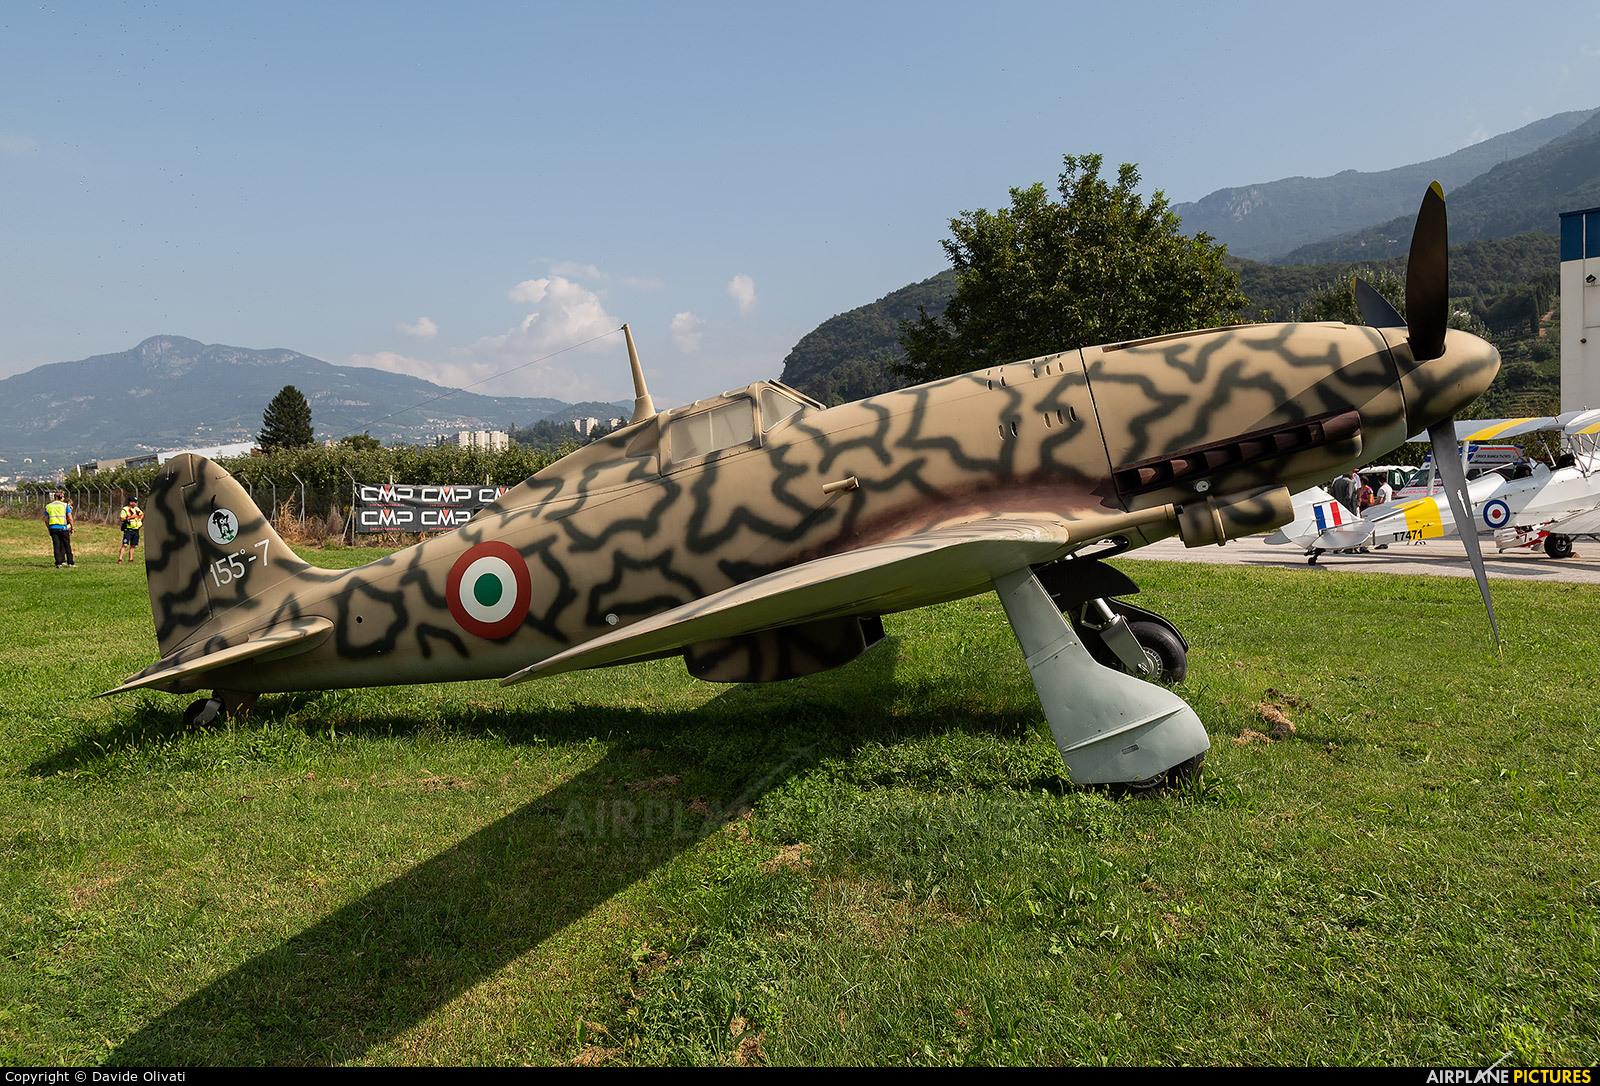 Italy - Air Force MM9327 aircraft at Trento - Mattarello